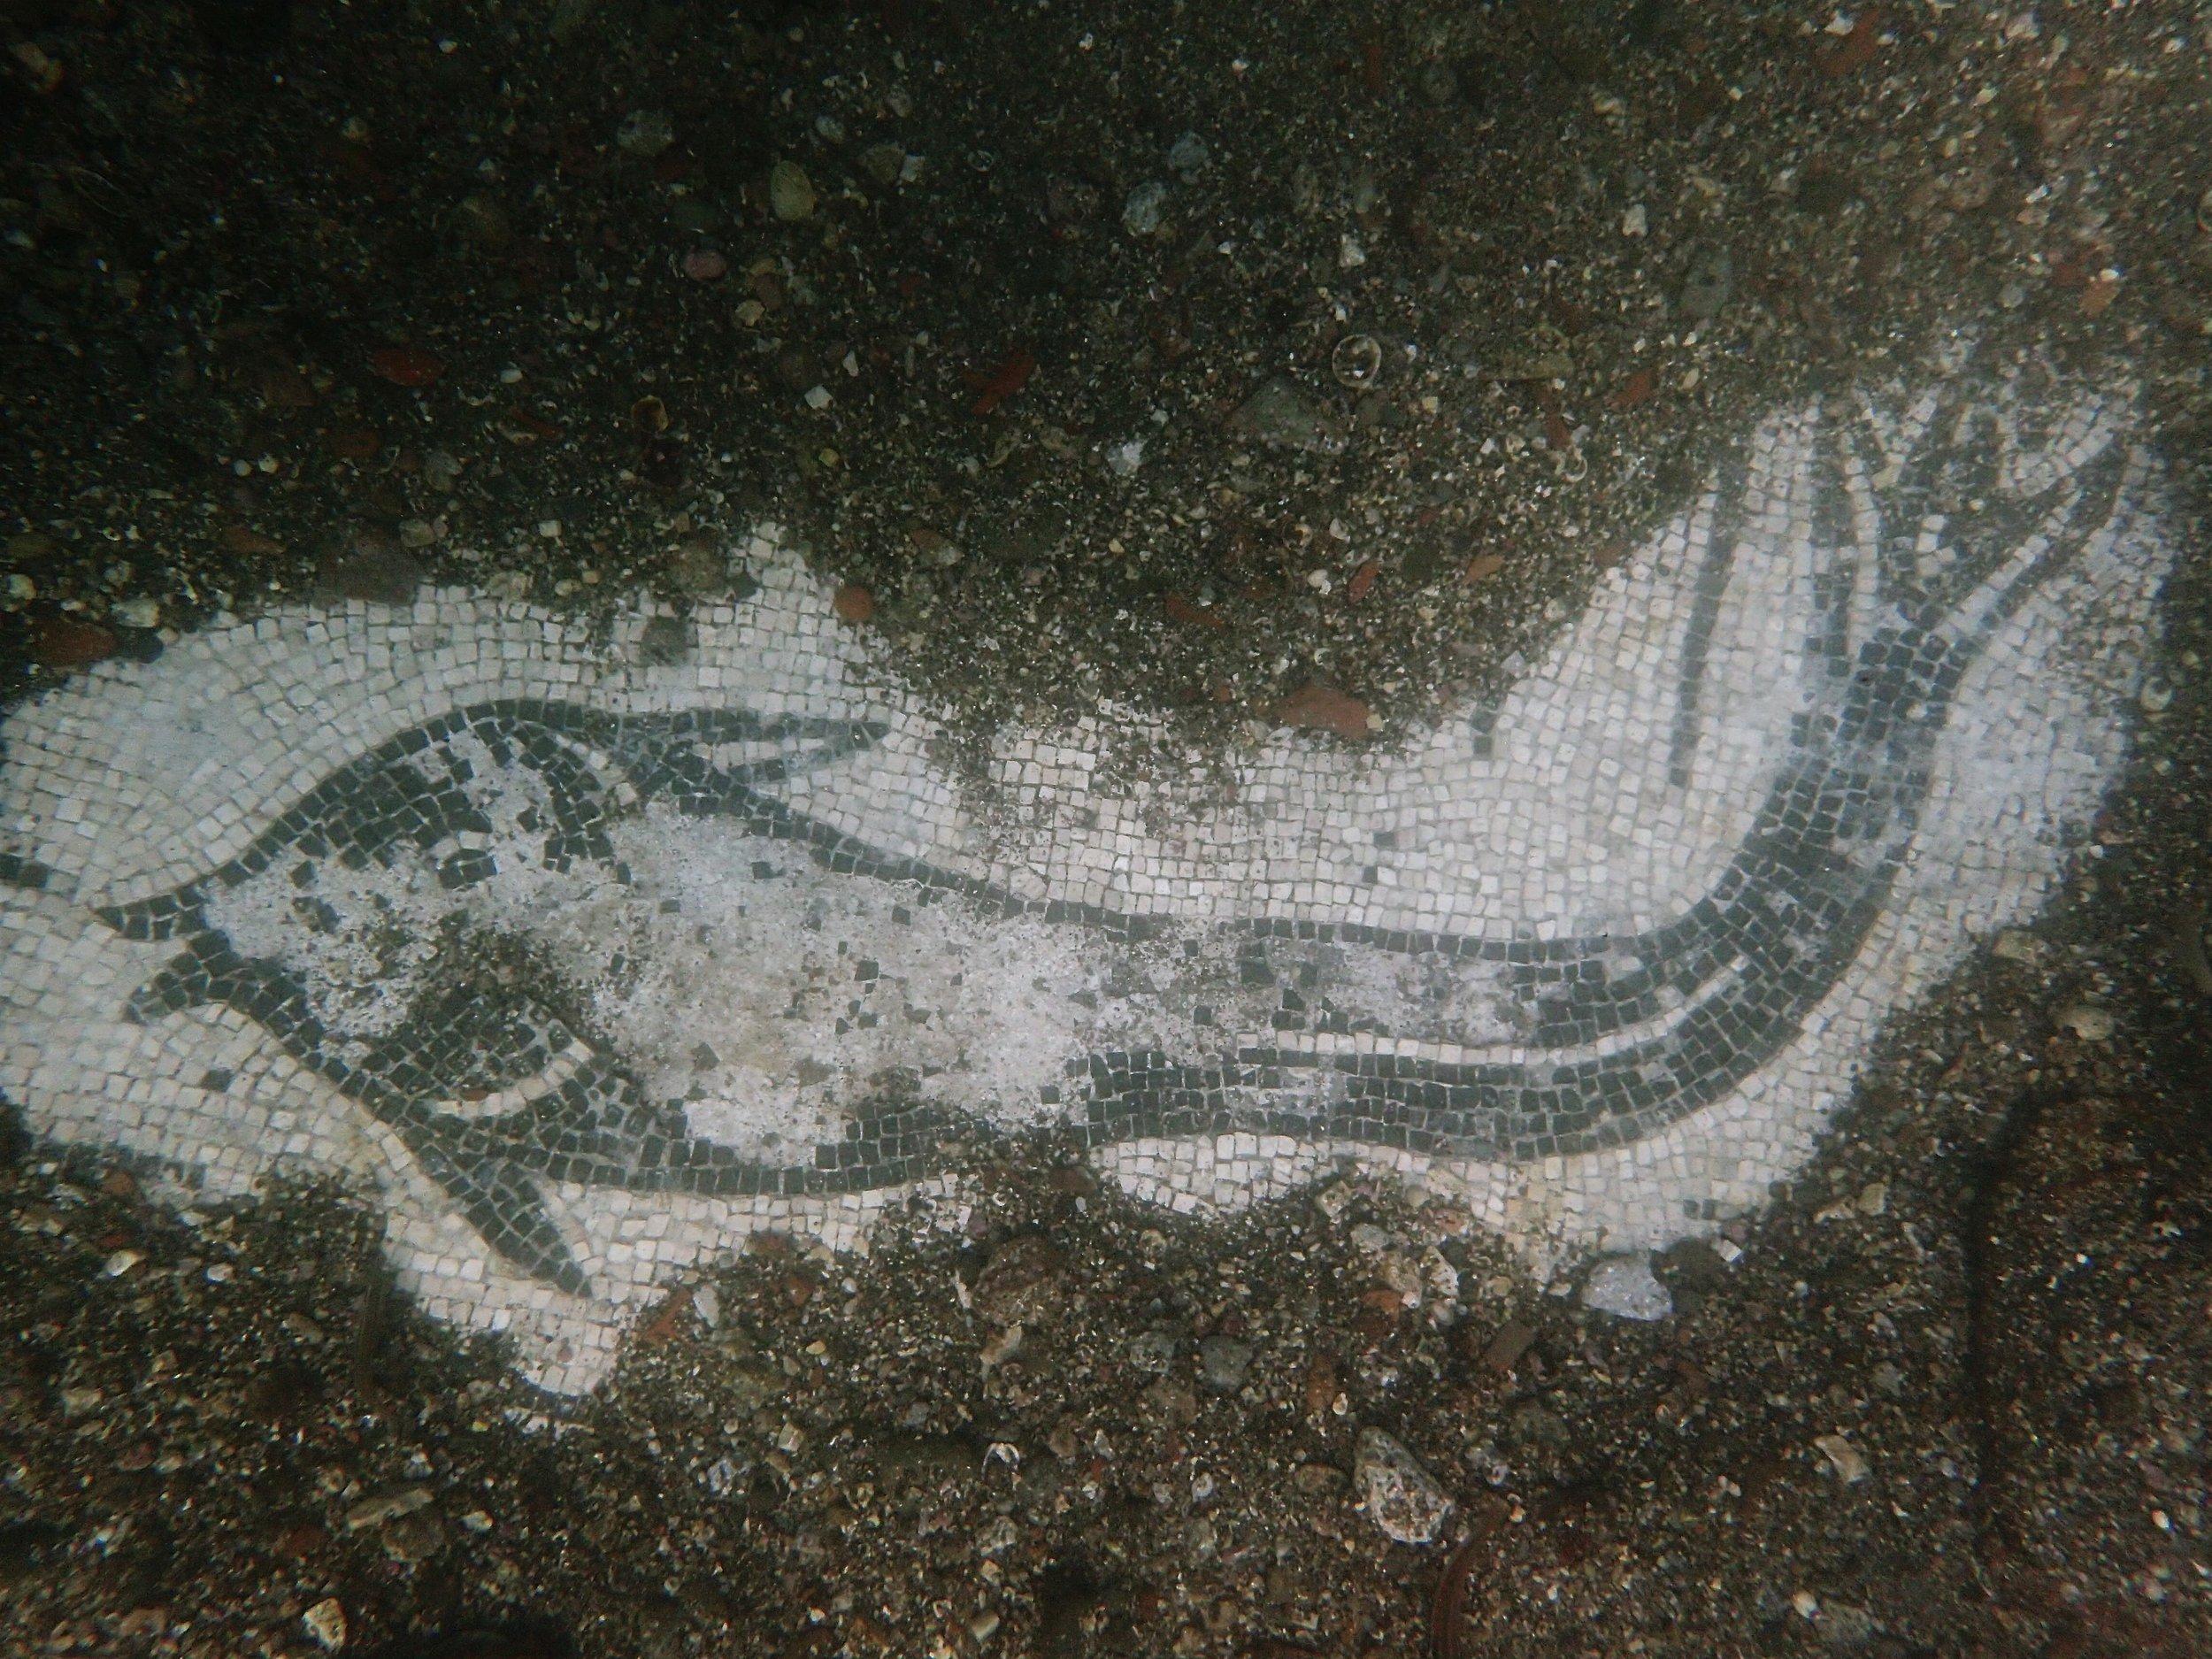 *NEW   *  Baia Underwater Archeological Park - July 9, 2019